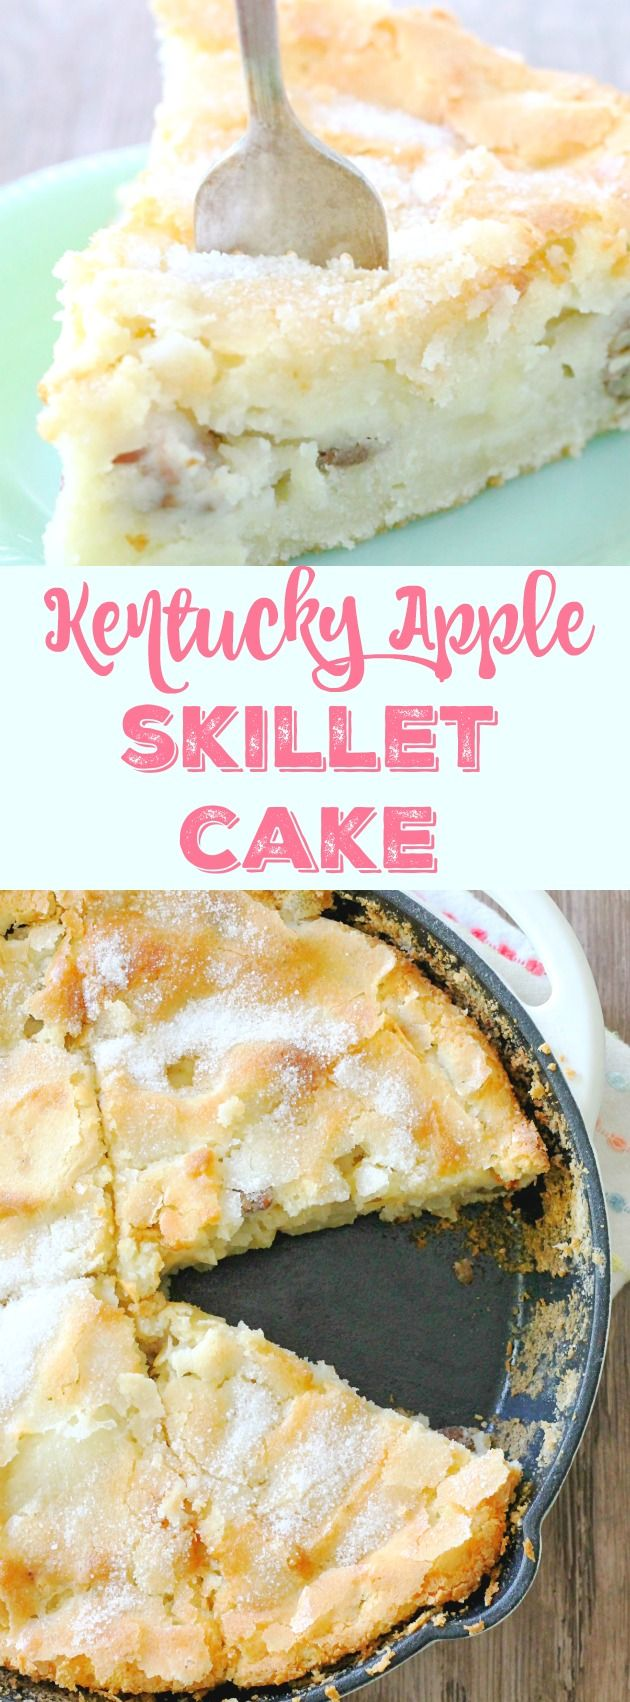 Kentucky Apple Skillet Cake #applerecipes